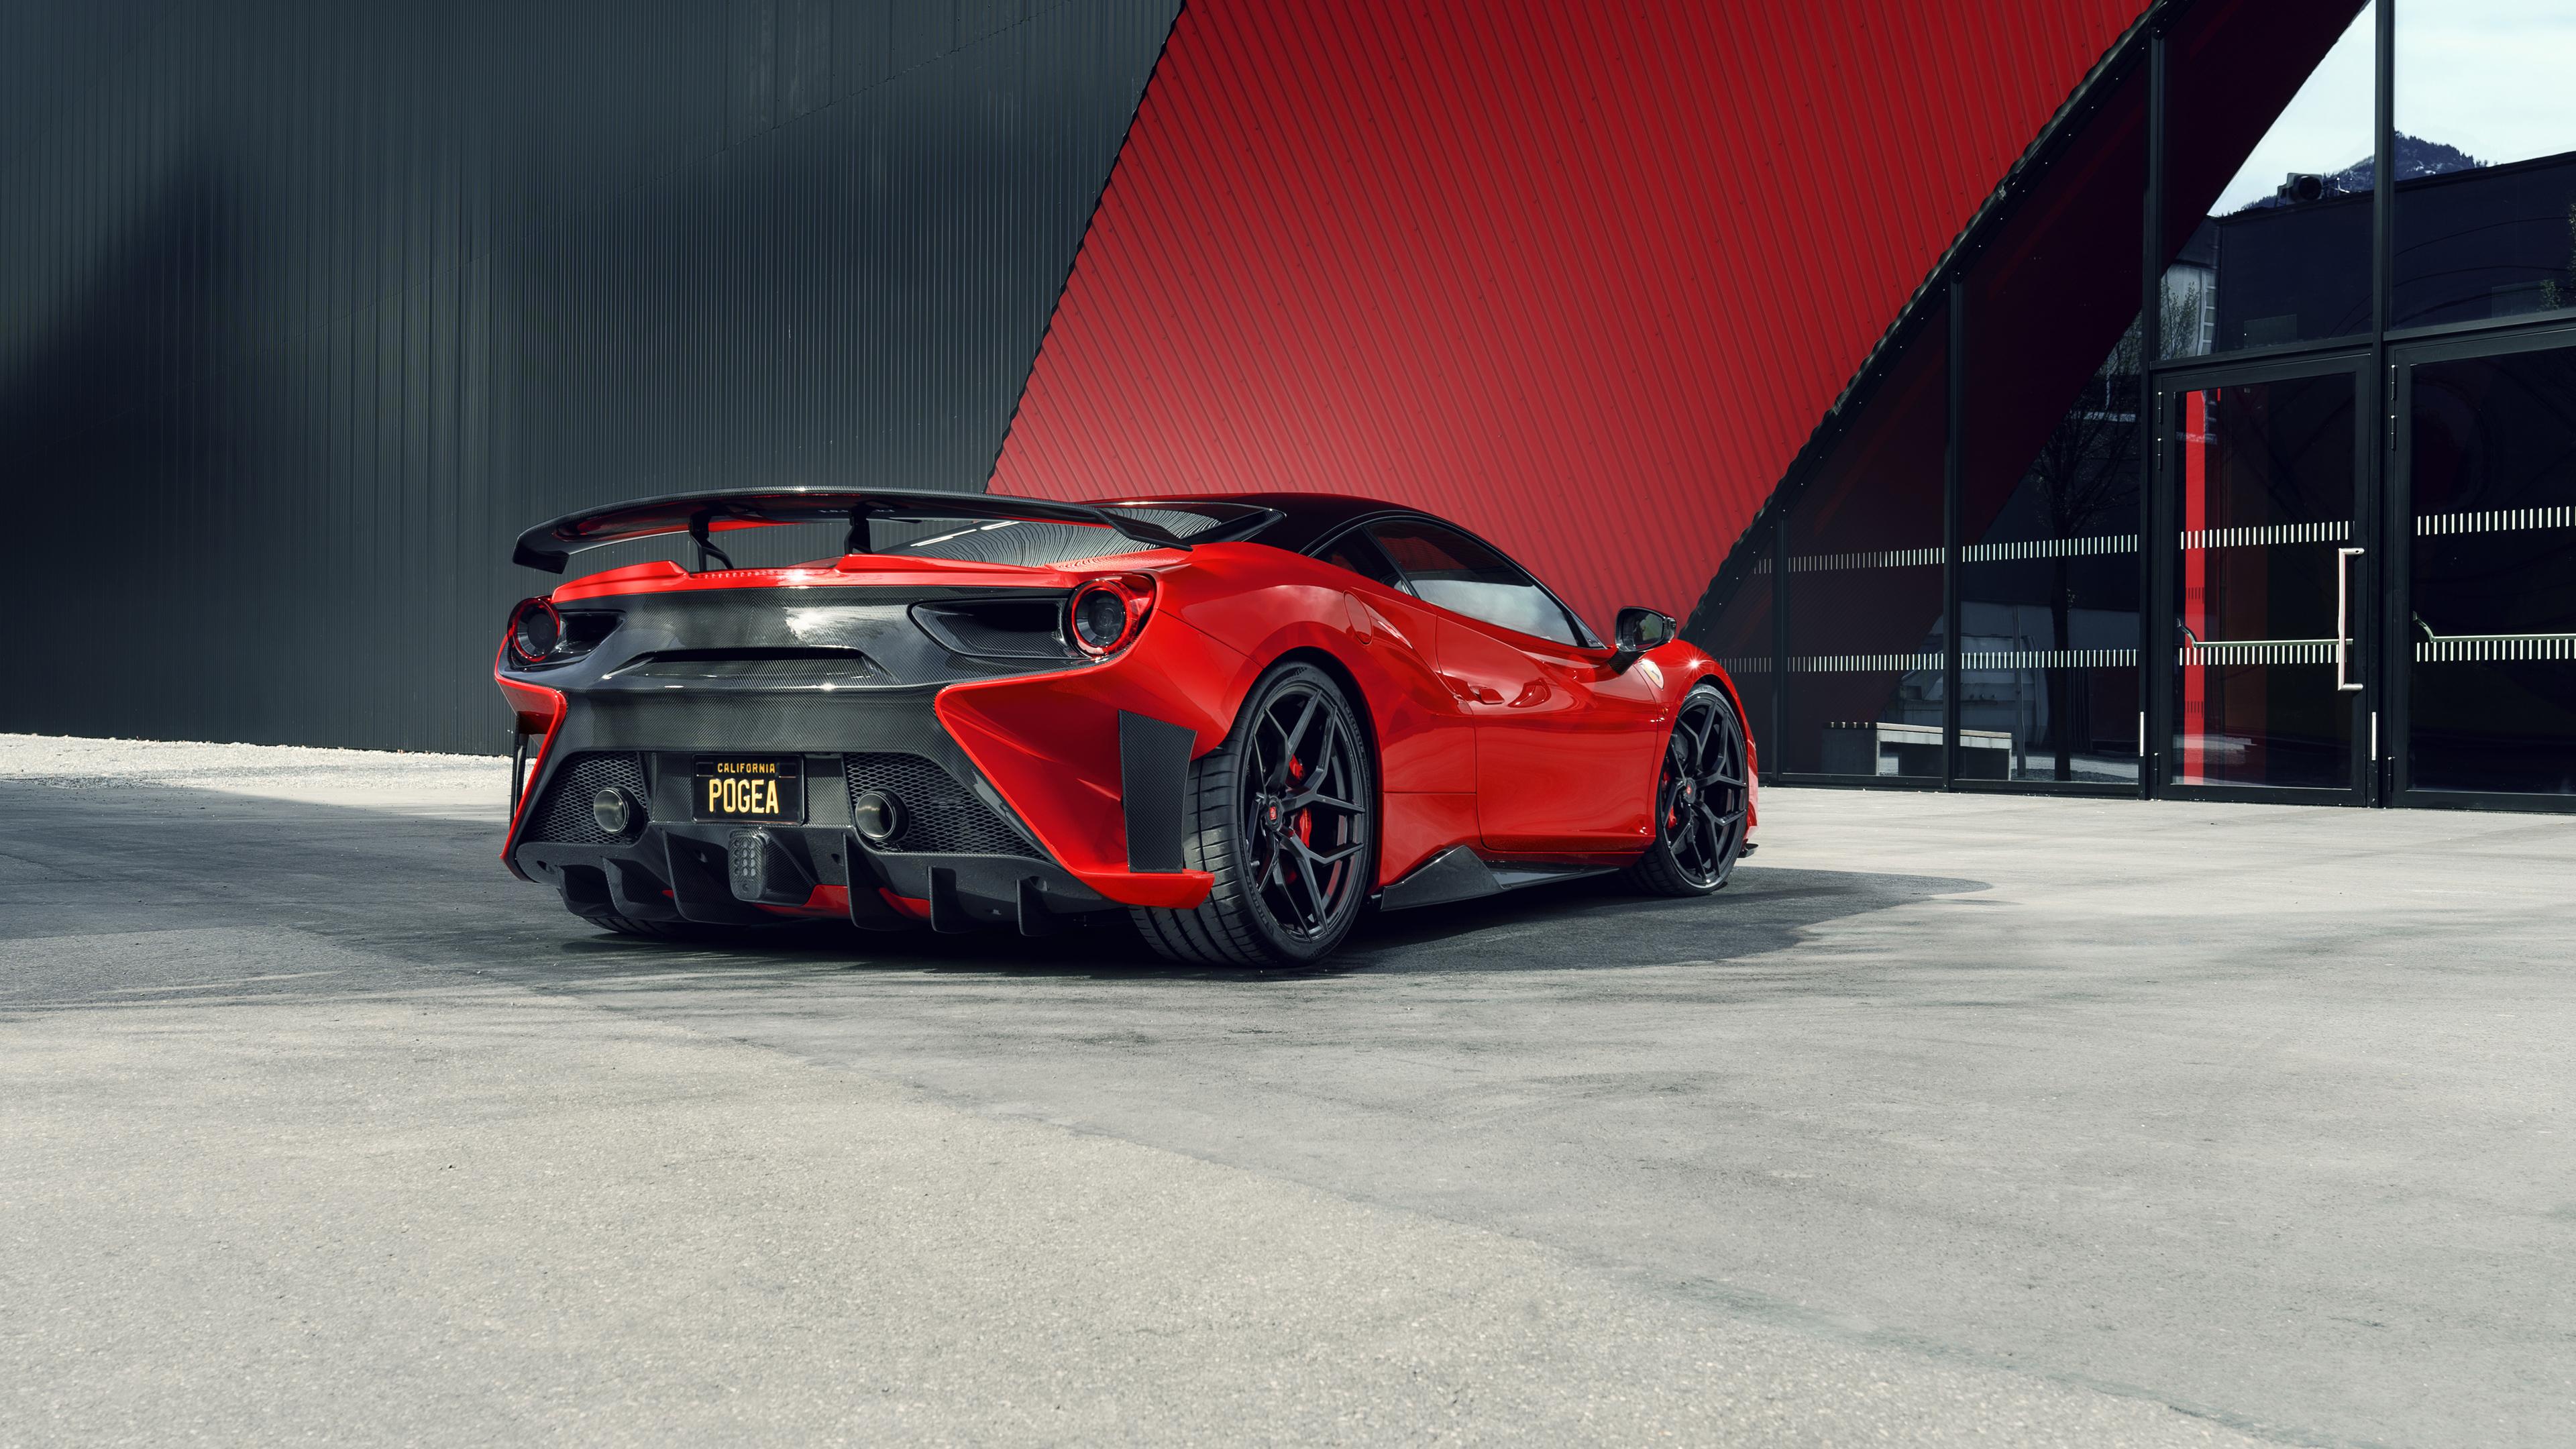 ferrari 4k 488 racing gtb pogea wallpapers fplus corsa ultra cars rear boost gives 1440 2560 1080 horsepower hdcarwallpapers resolutions